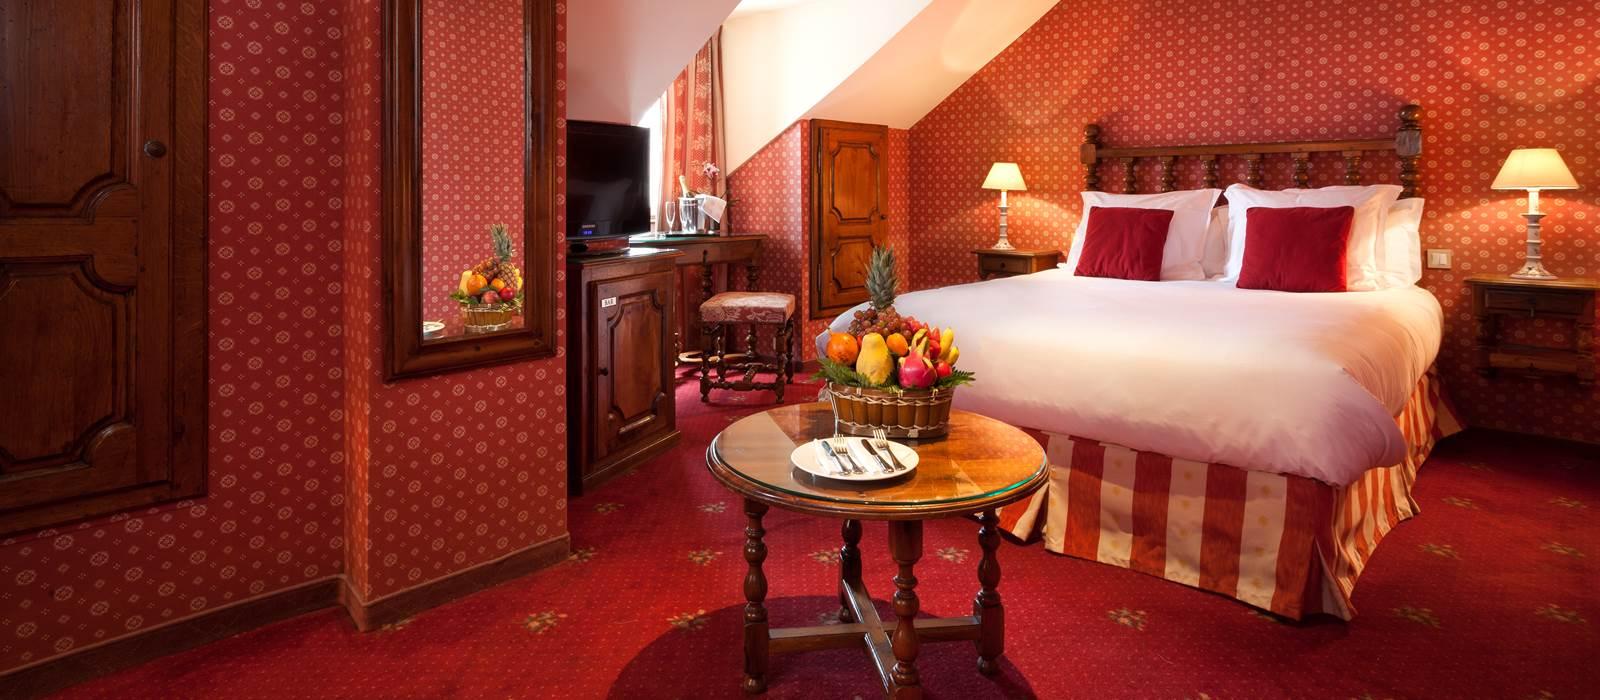 H tel amarante beau manoir jjw hotels resorts for Boutique hotel paris 8e